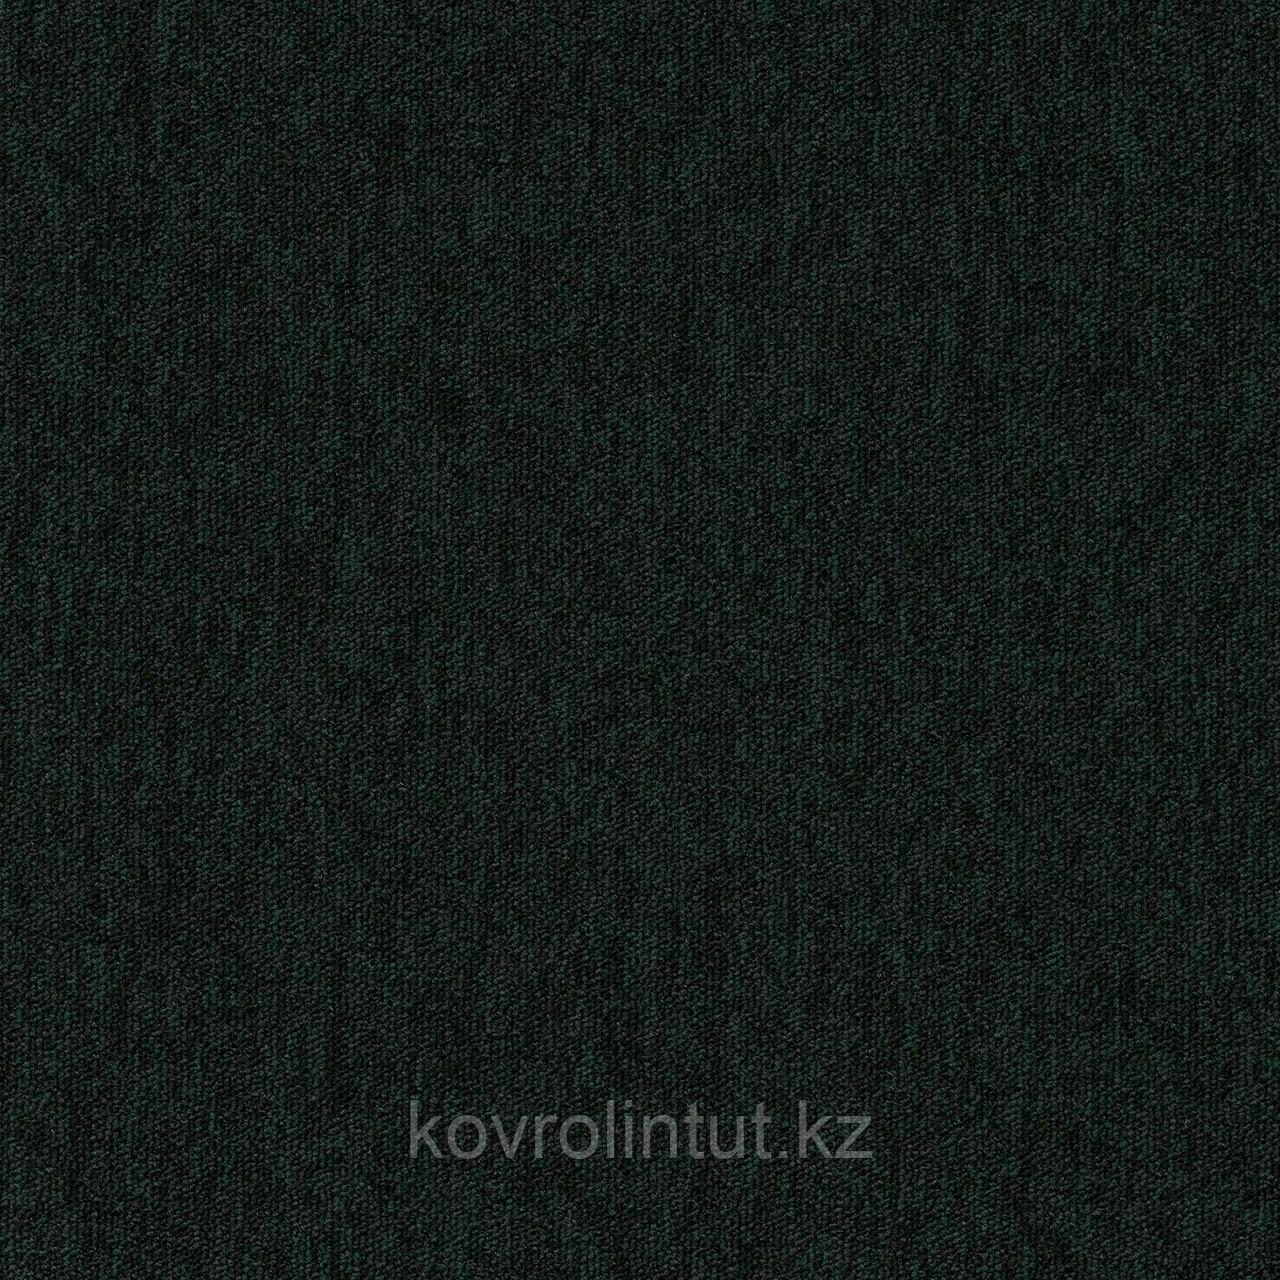 Плитка ковровая Modulyss First 553, 100% PA